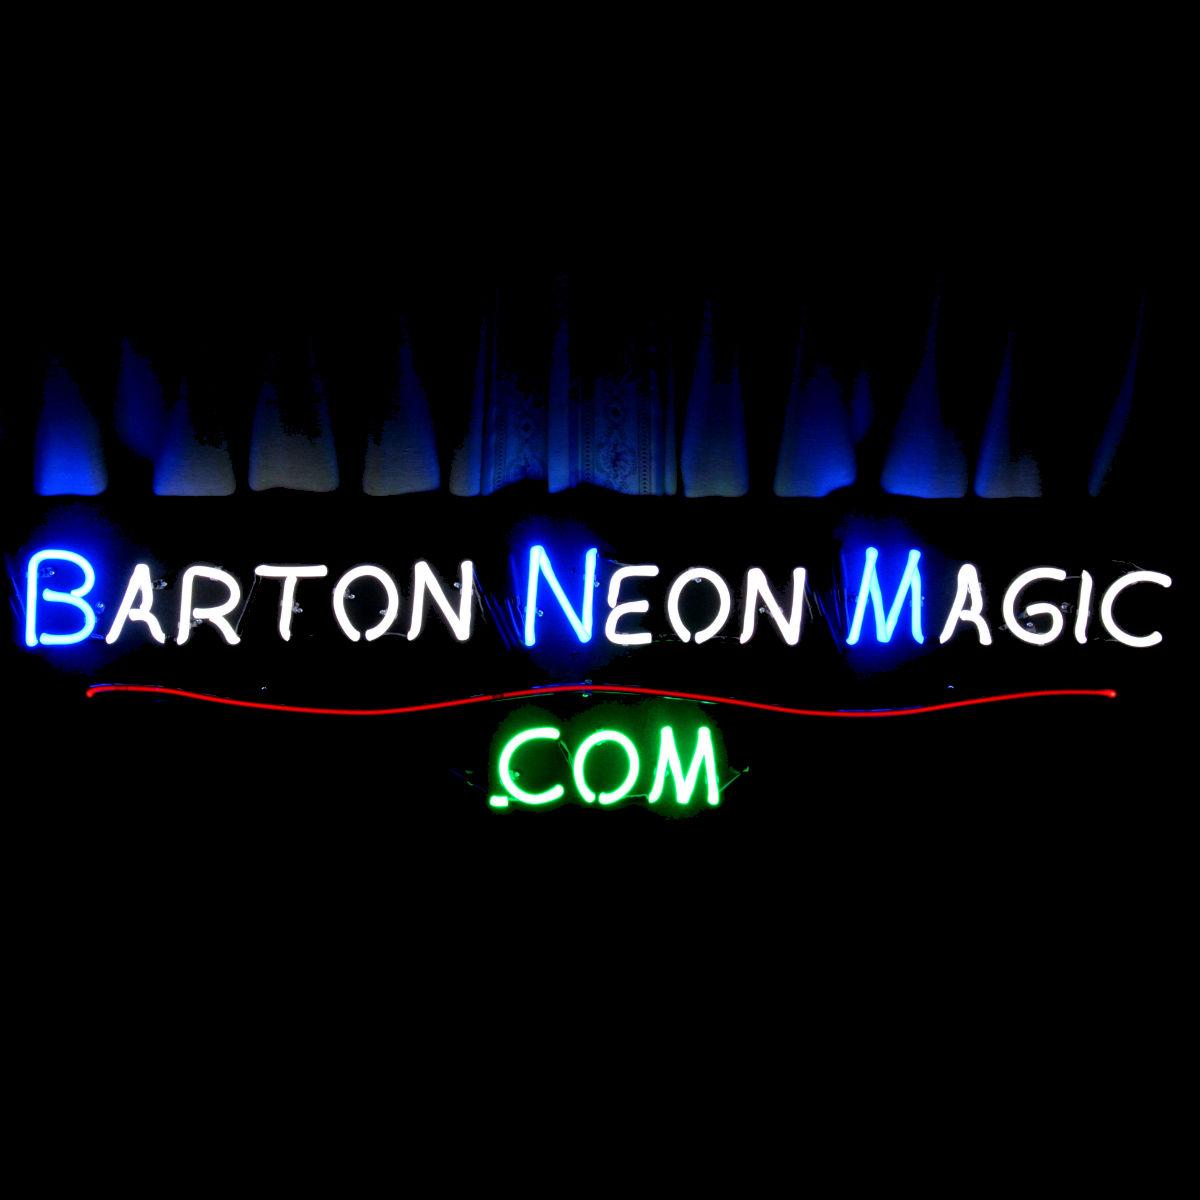 Custom Neon Signs, Chandeliers, Sculptures, Artworks by John Barton - BartonNeonMagic.com